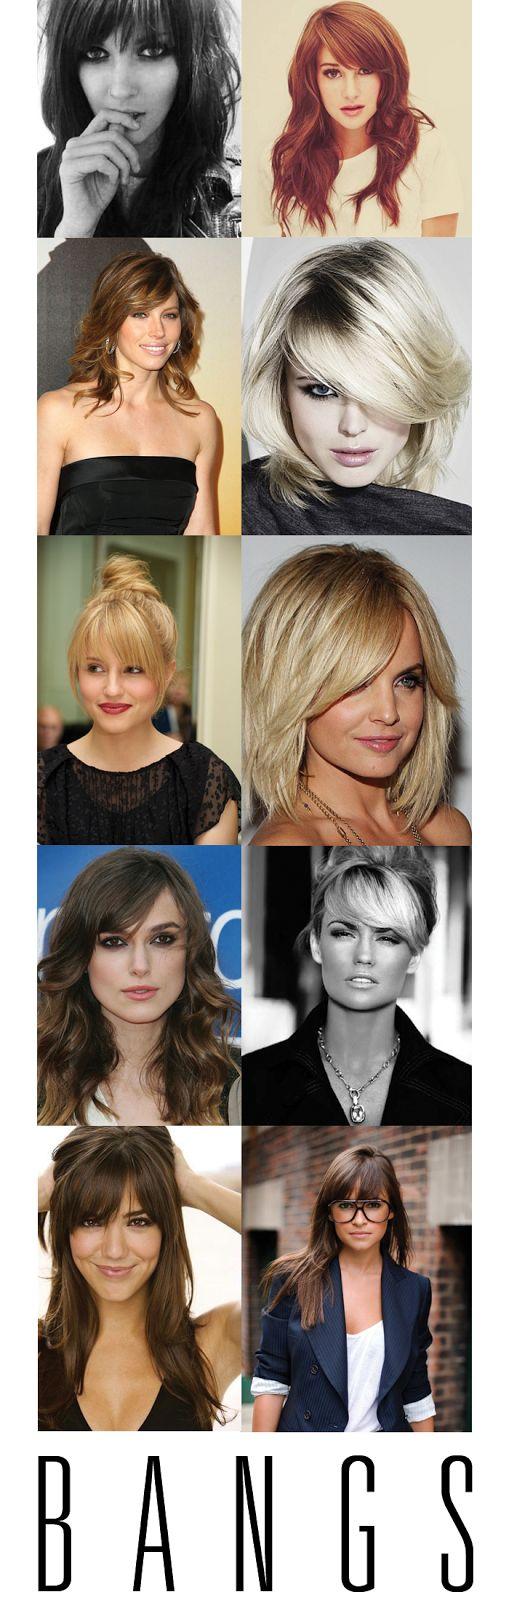 best hair makeover images on pinterest hair cut make up